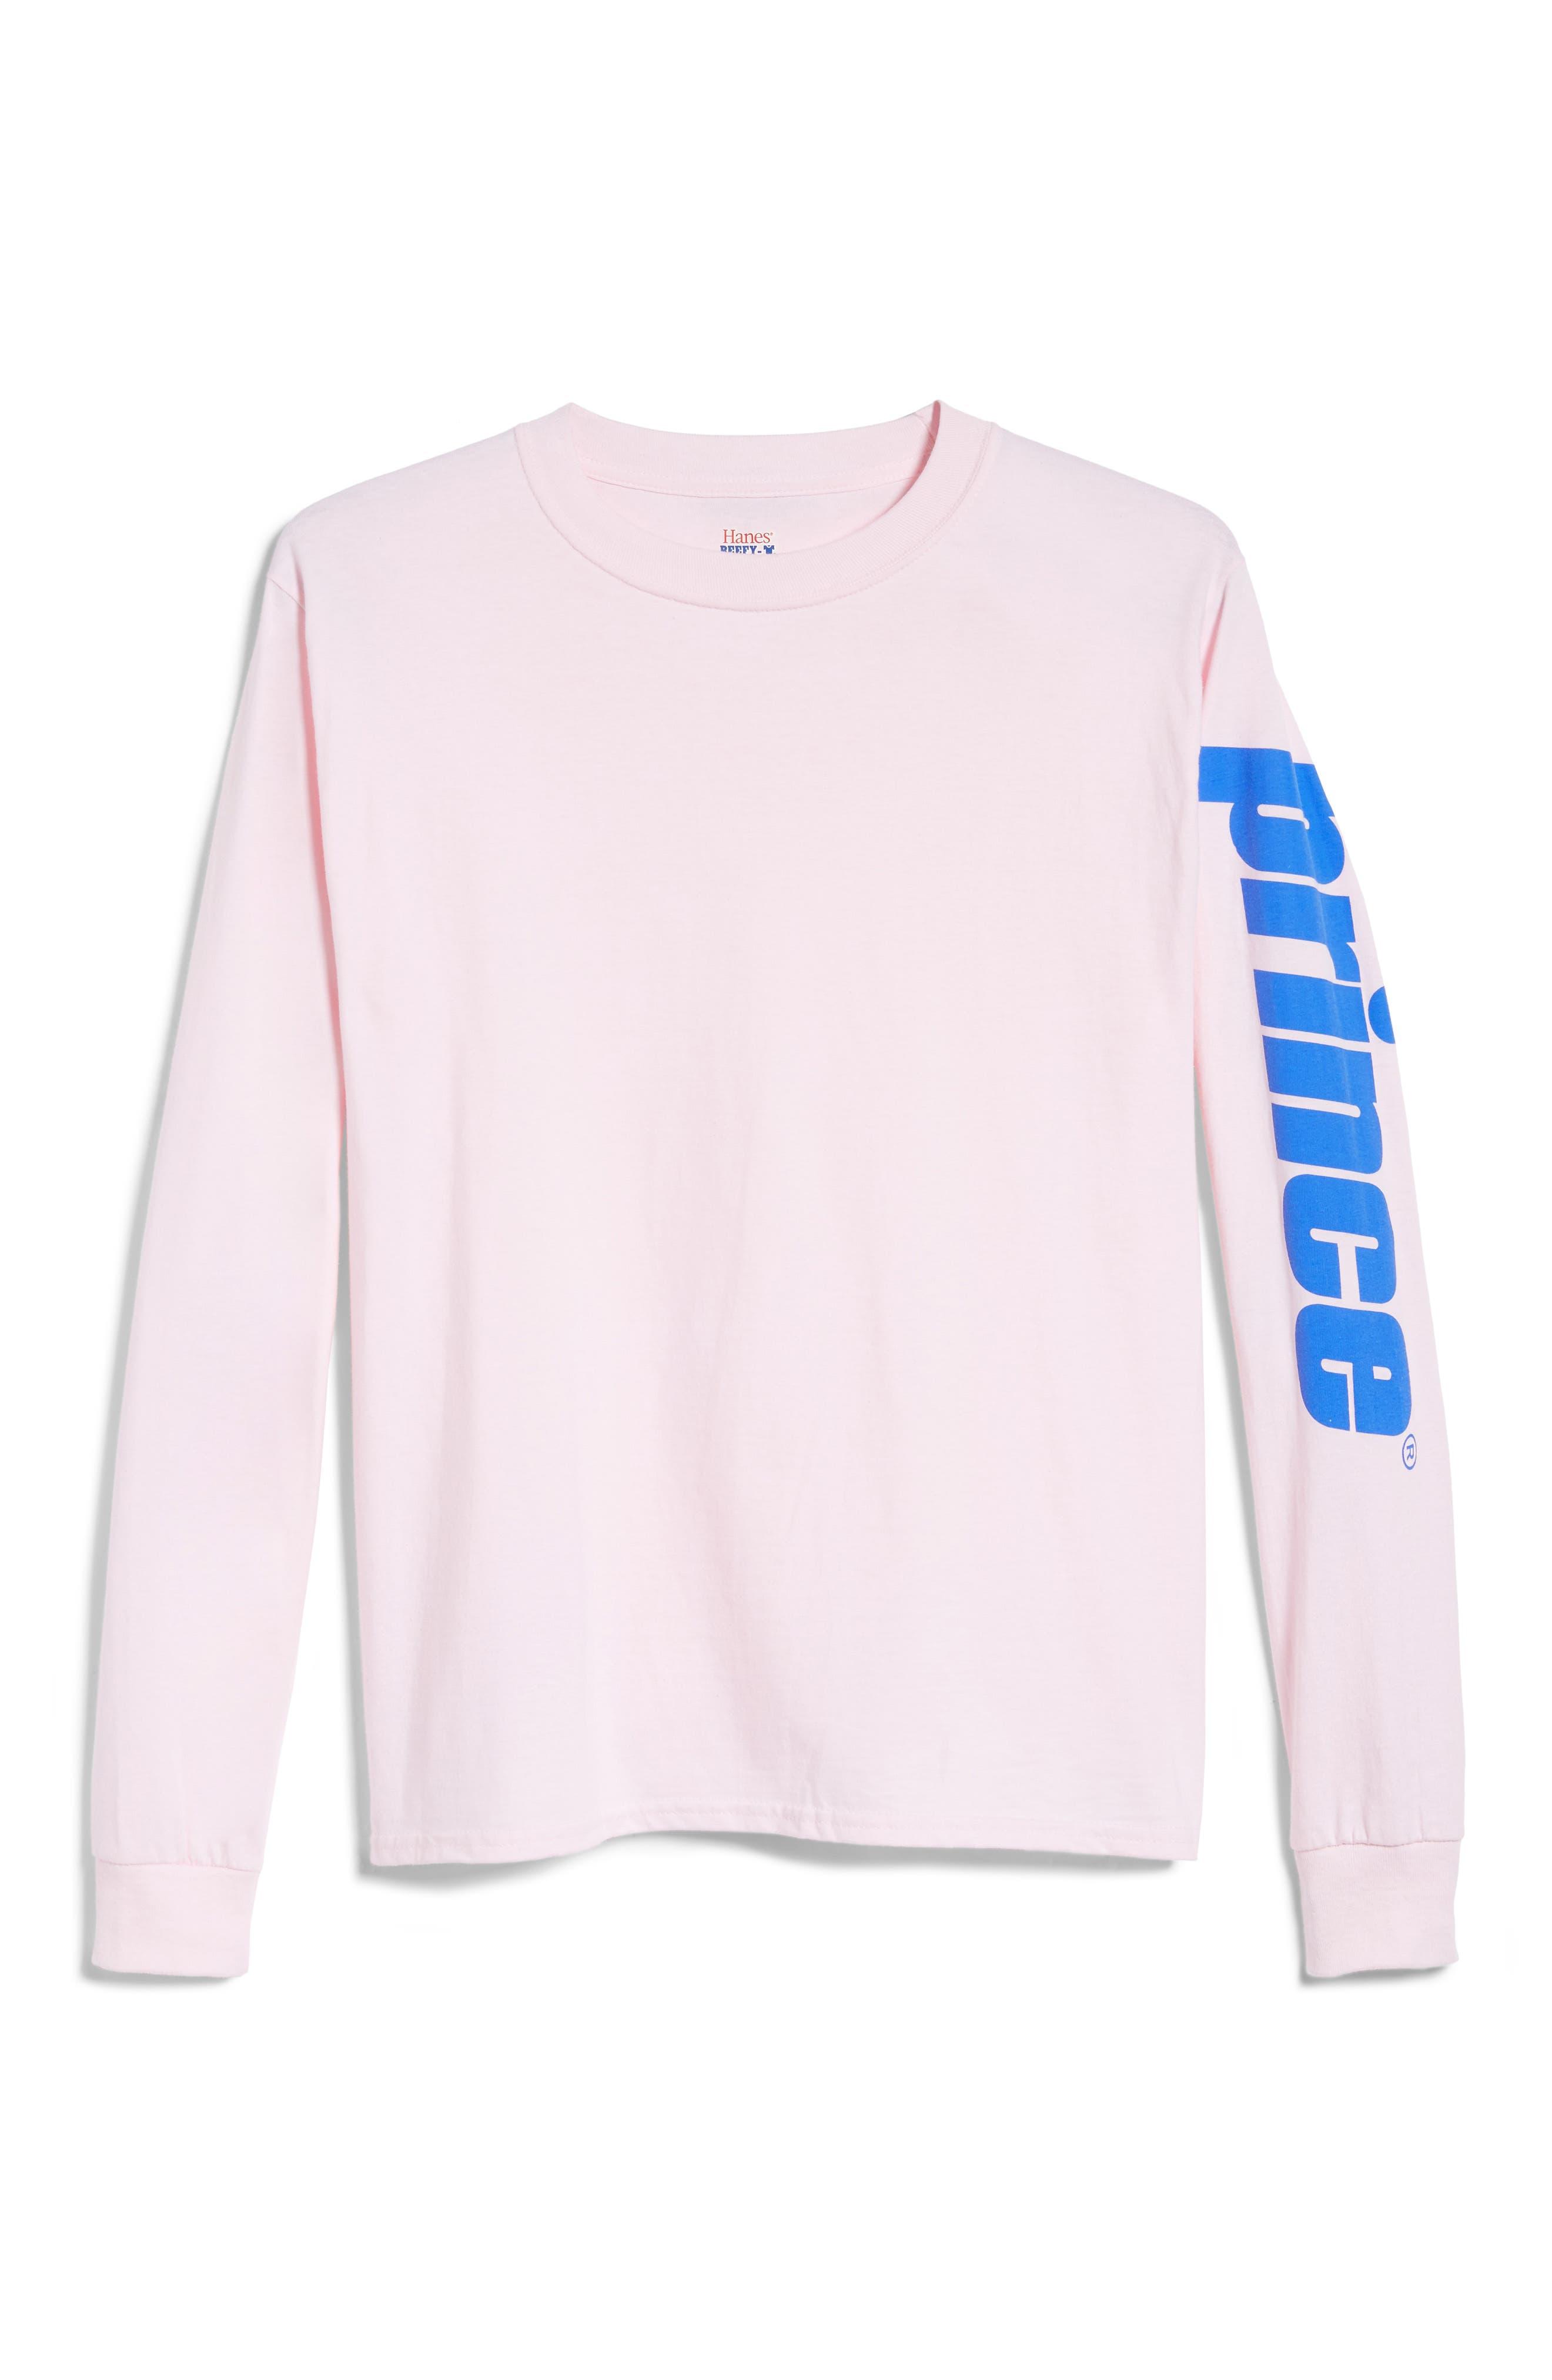 Prince Logo Long Sleeve T-Shirt